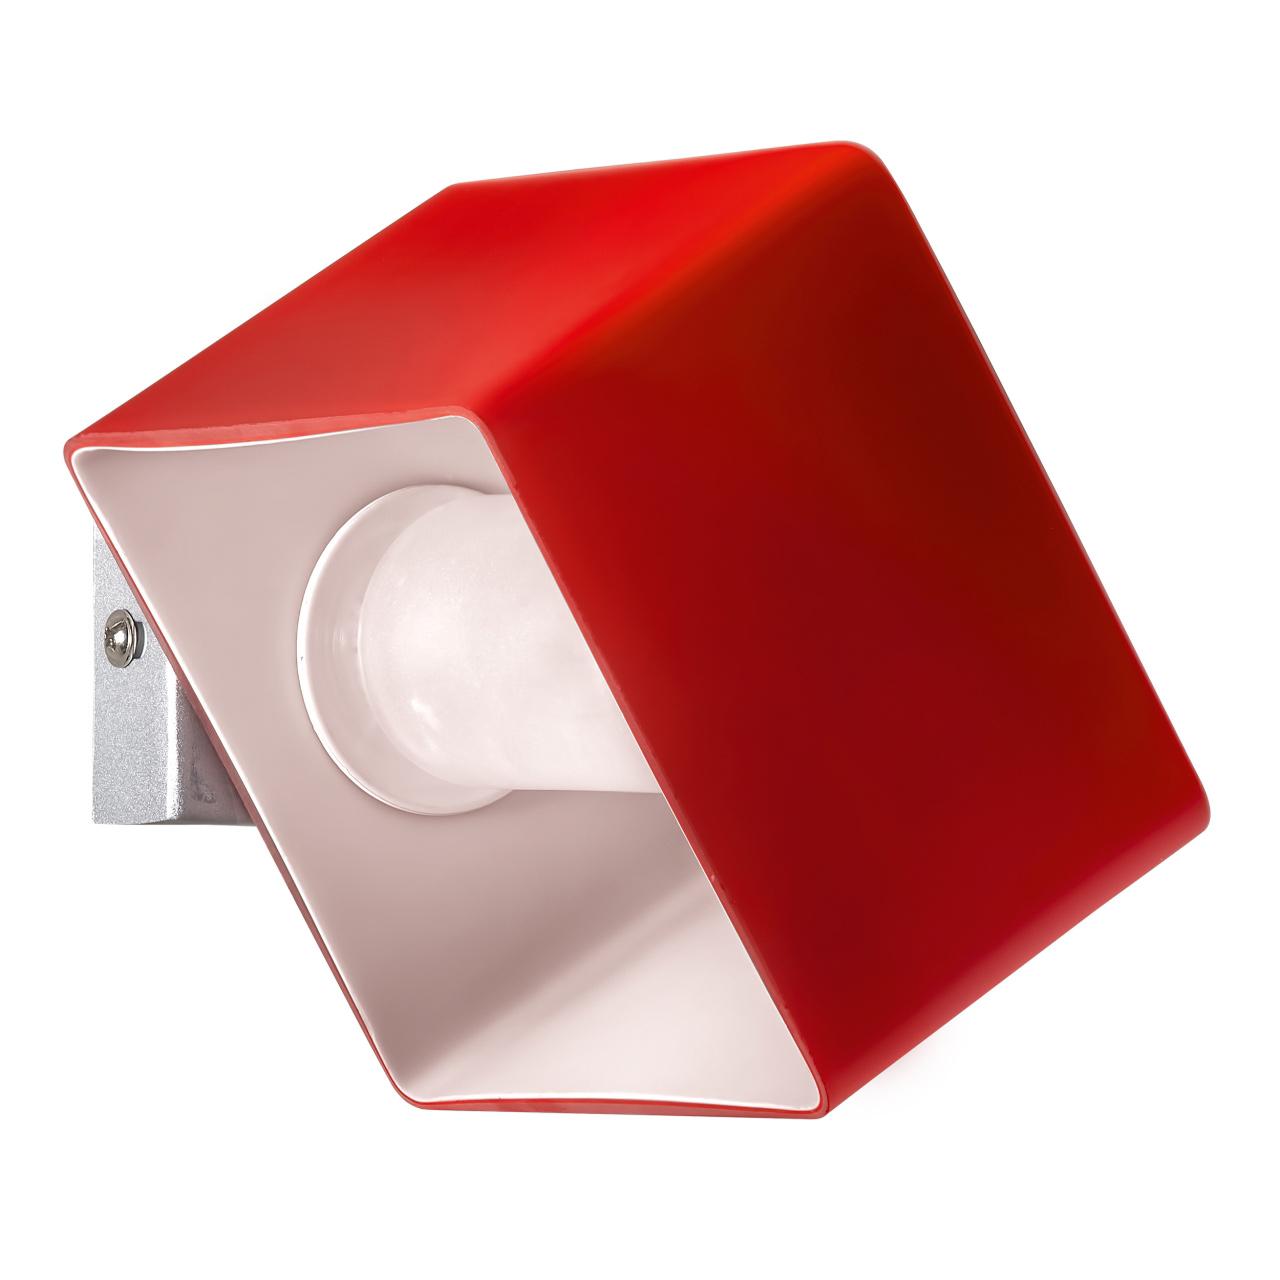 Светильник настенный Pezzo 1х40W G9 хром/красный Lightstar 801612